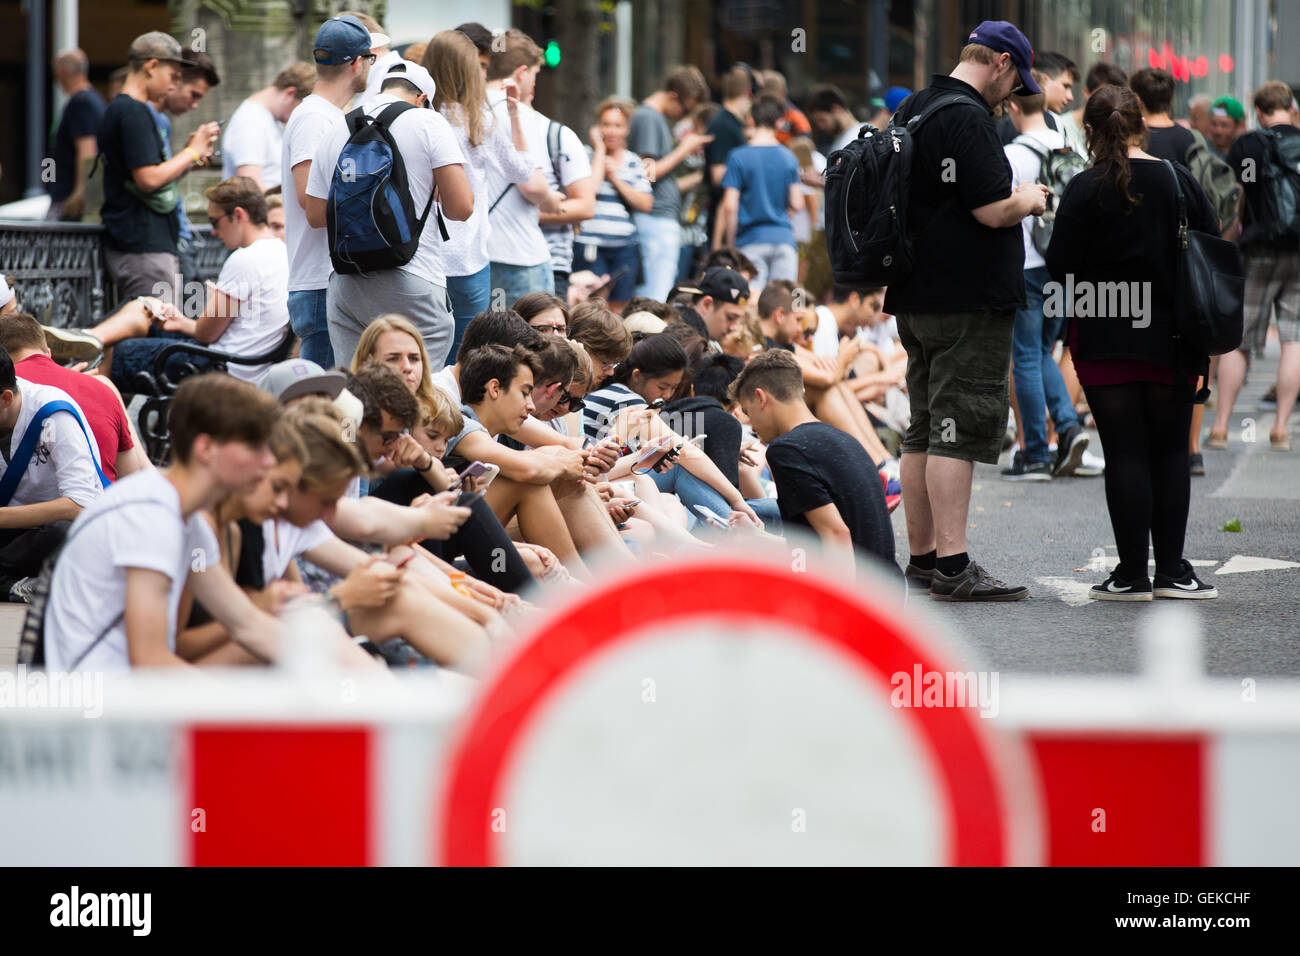 Duesseldorf, Germany. 27th July, 2016. Teenagers playing 'Pokemon Go' on the Giradet bridge at Koenigsallee - Stock Image